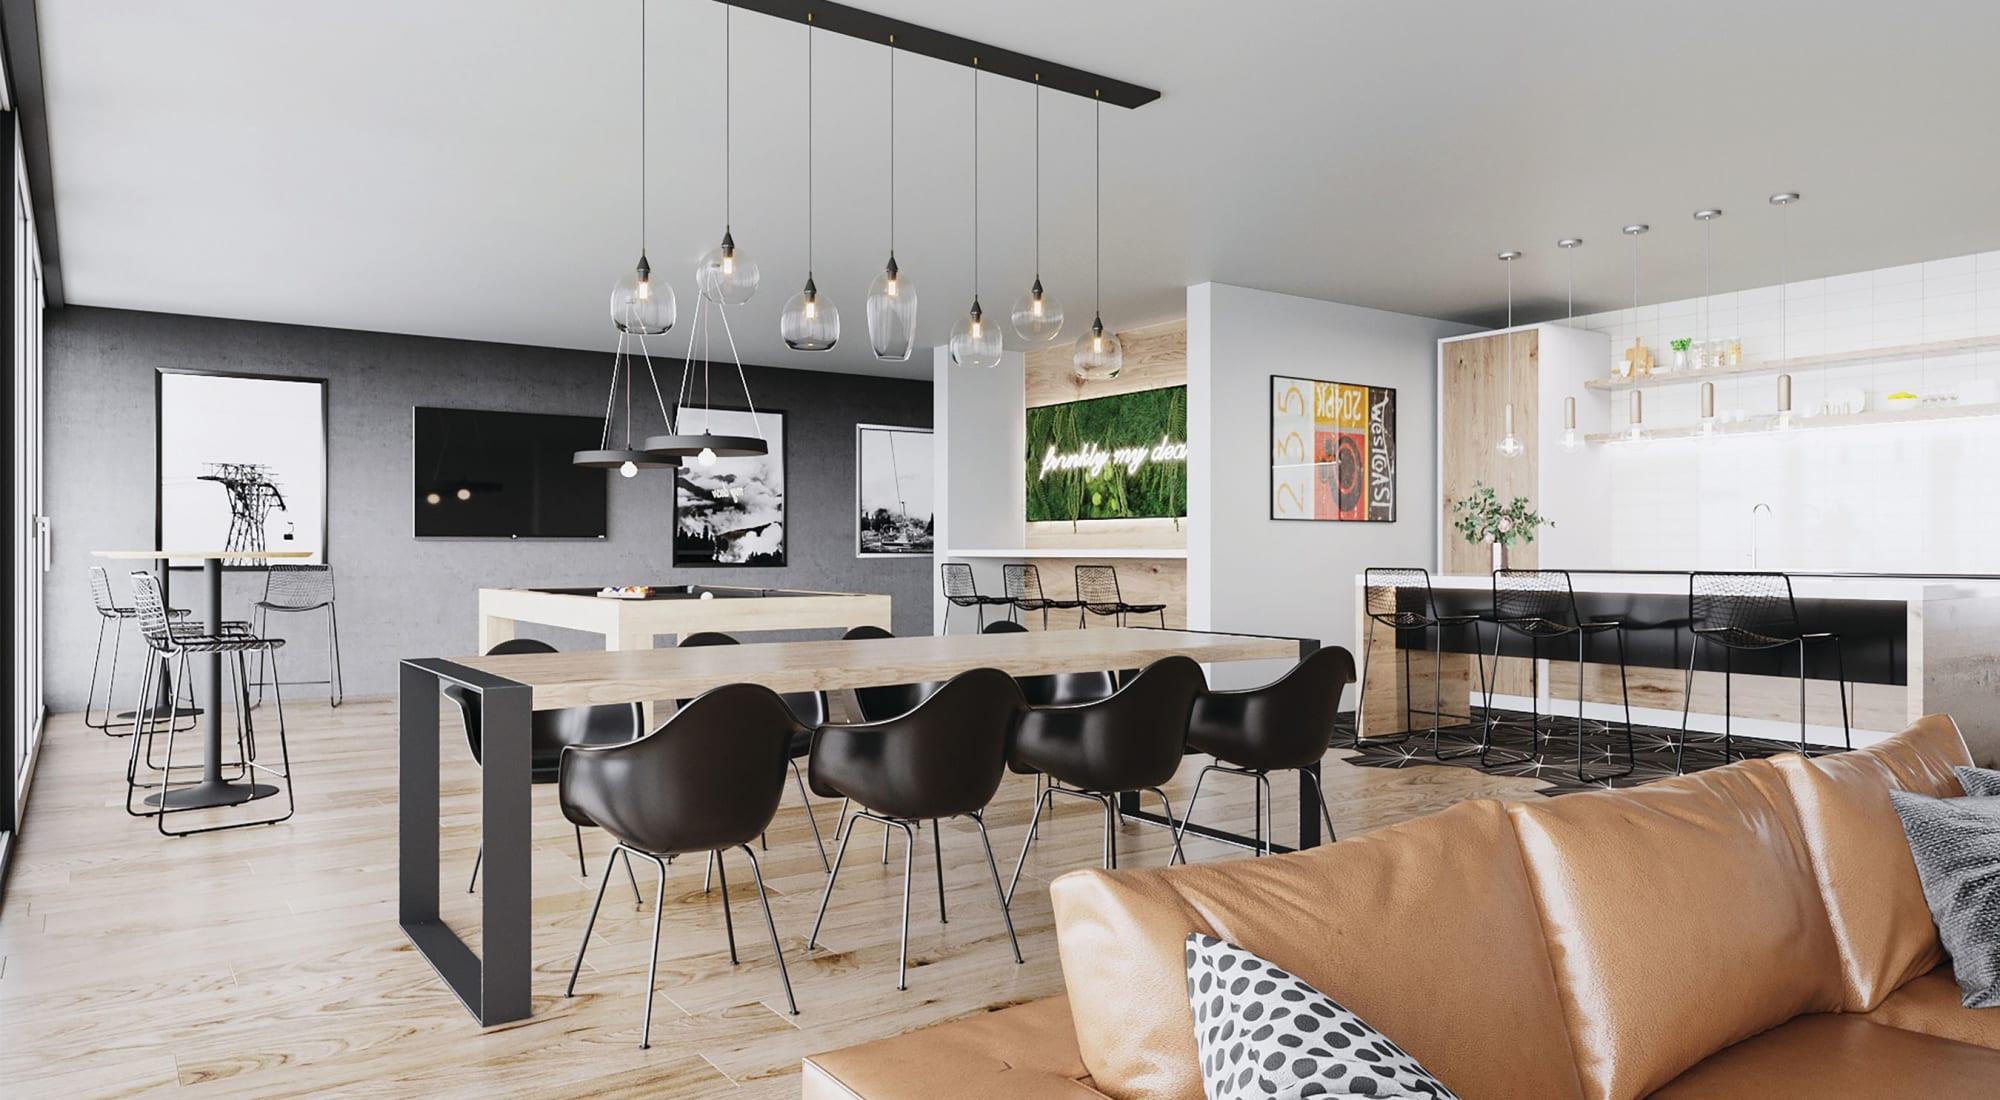 Dining room at Blackbird in Redmond, WA